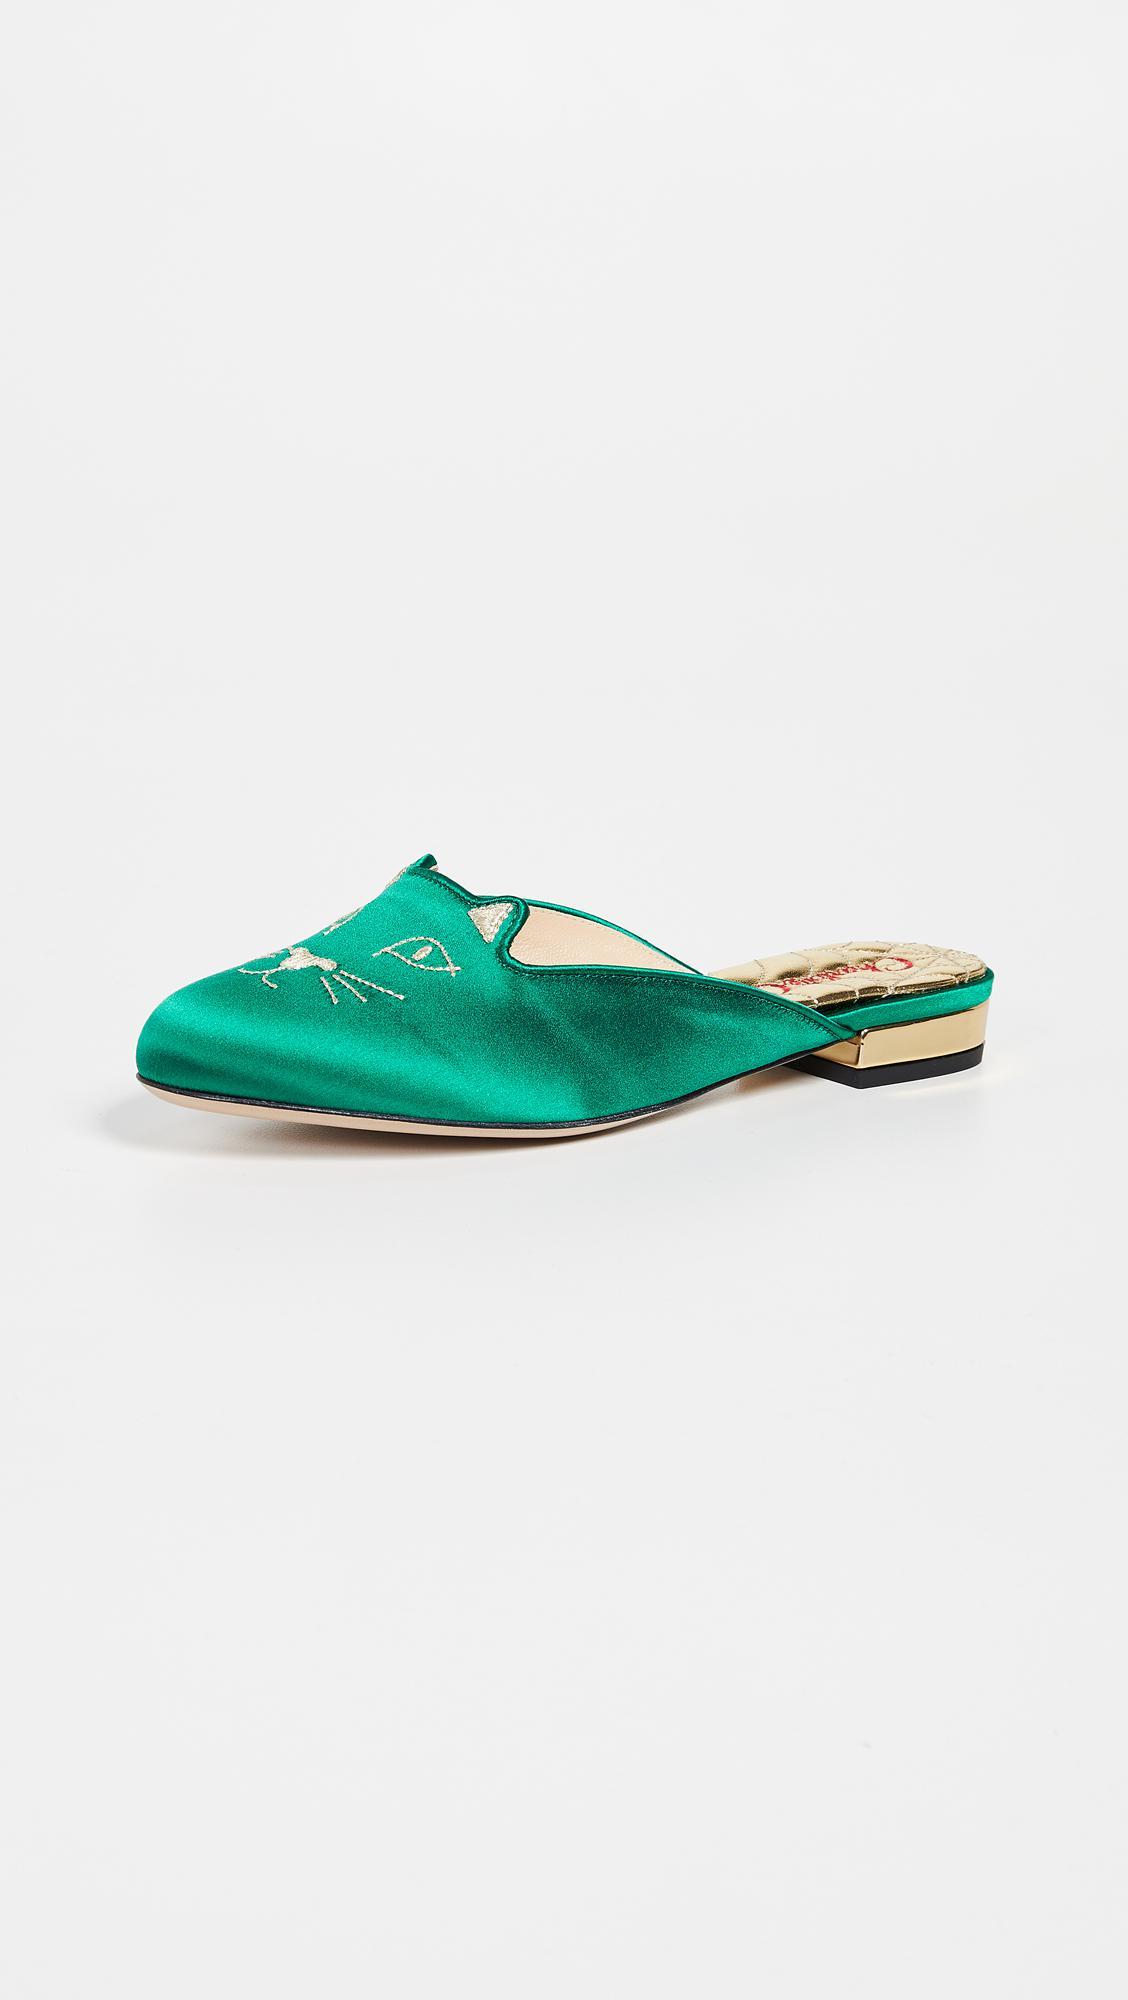 72b4e3ea913 Lyst - Charlotte Olympia Kitty Slippers in Green